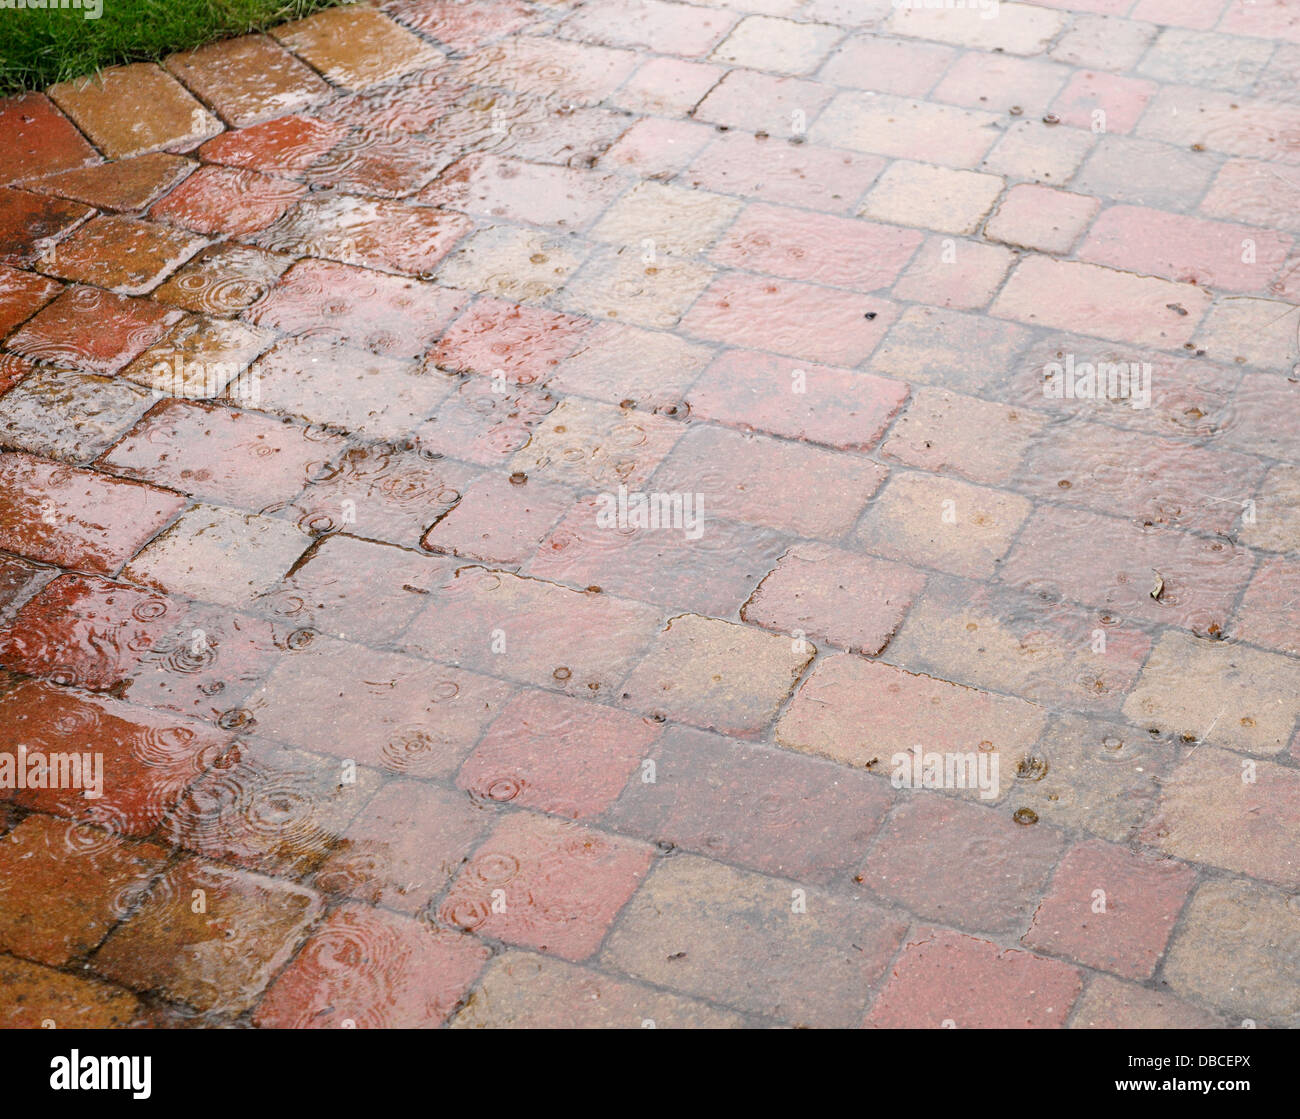 https www alamy com stock photo heavy raindrops splashing on rustic red brick patio paving in uk garden 58667362 html